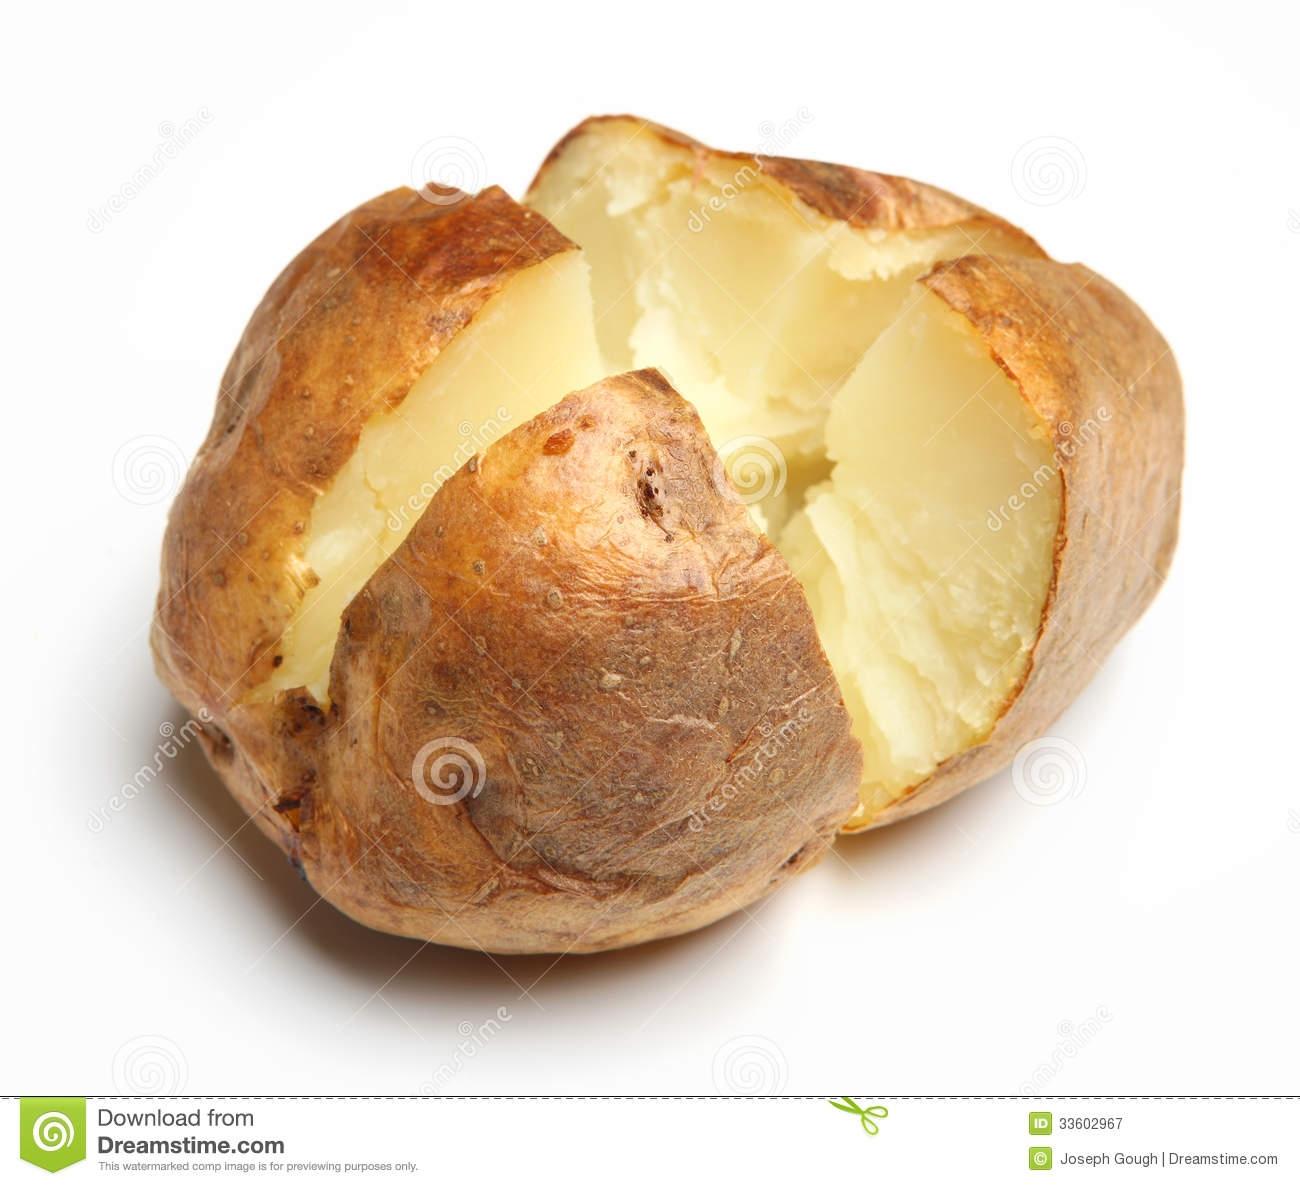 Potato clipart baked potato #3 - Baked Potato PNG HD